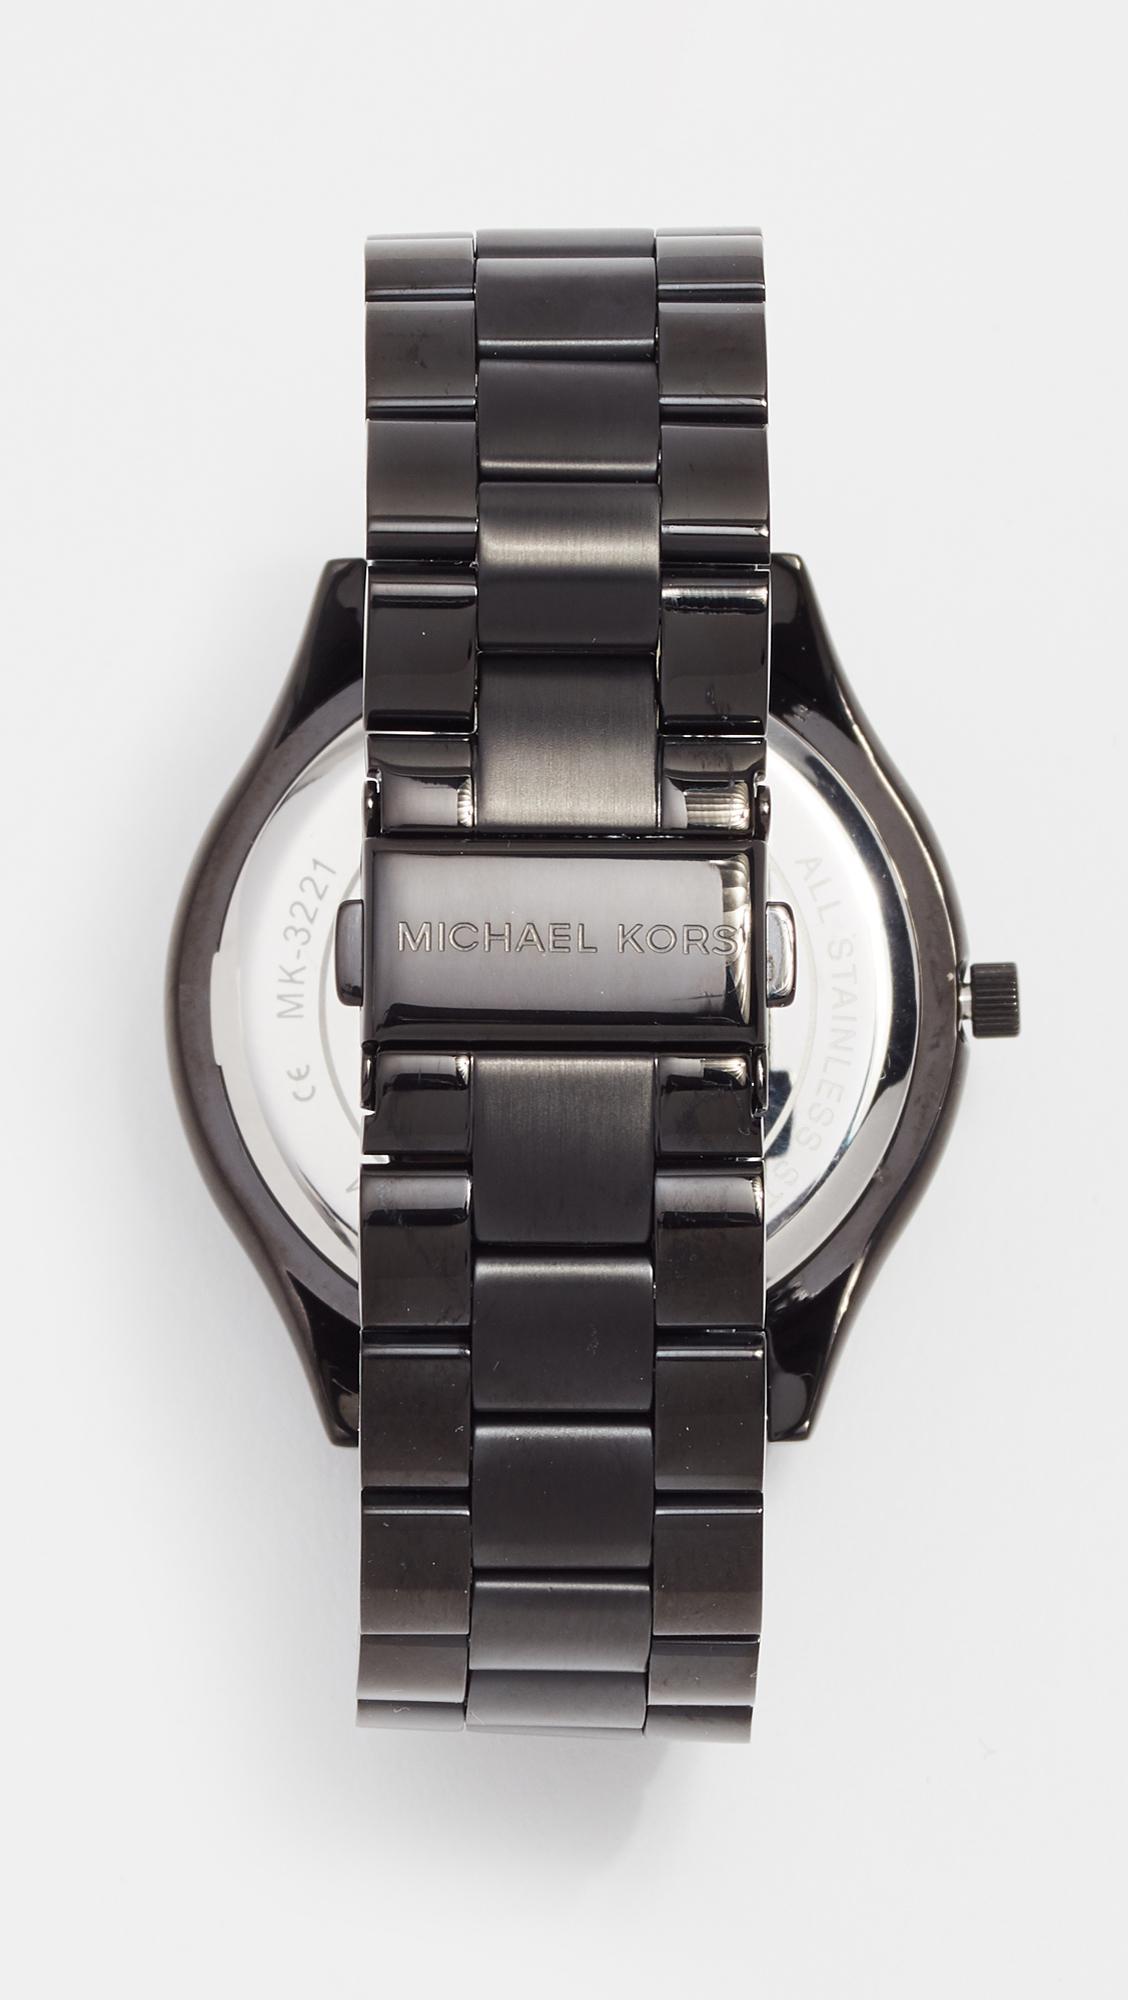 a6b820fdce0b Lyst - Michael Kors Slim Runway Watch in Black